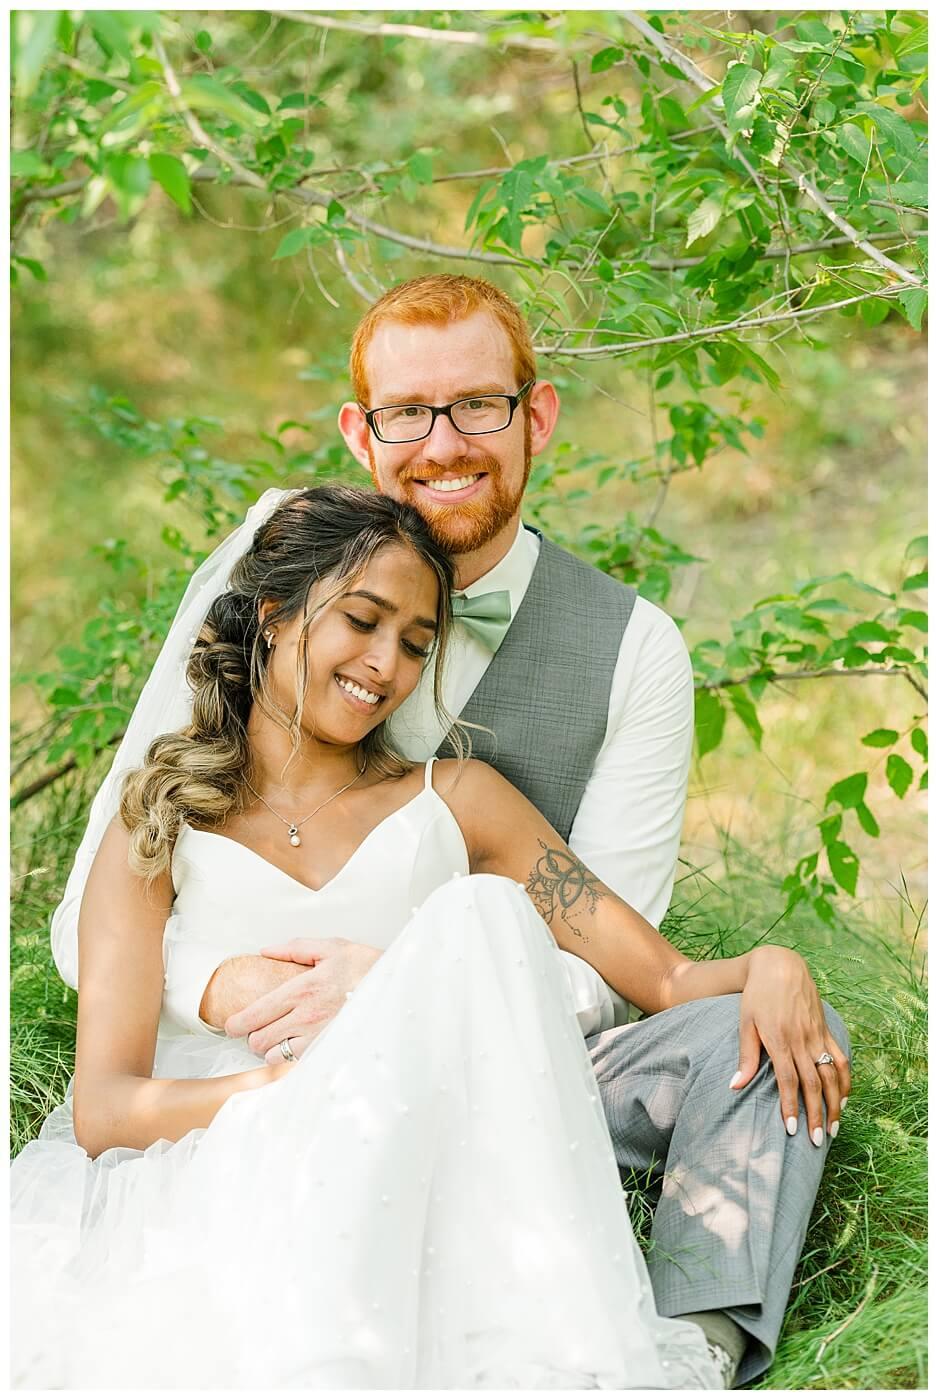 Stephen & Sarah Wedding - 17 - Bride and groom sitting with groom looking at camera